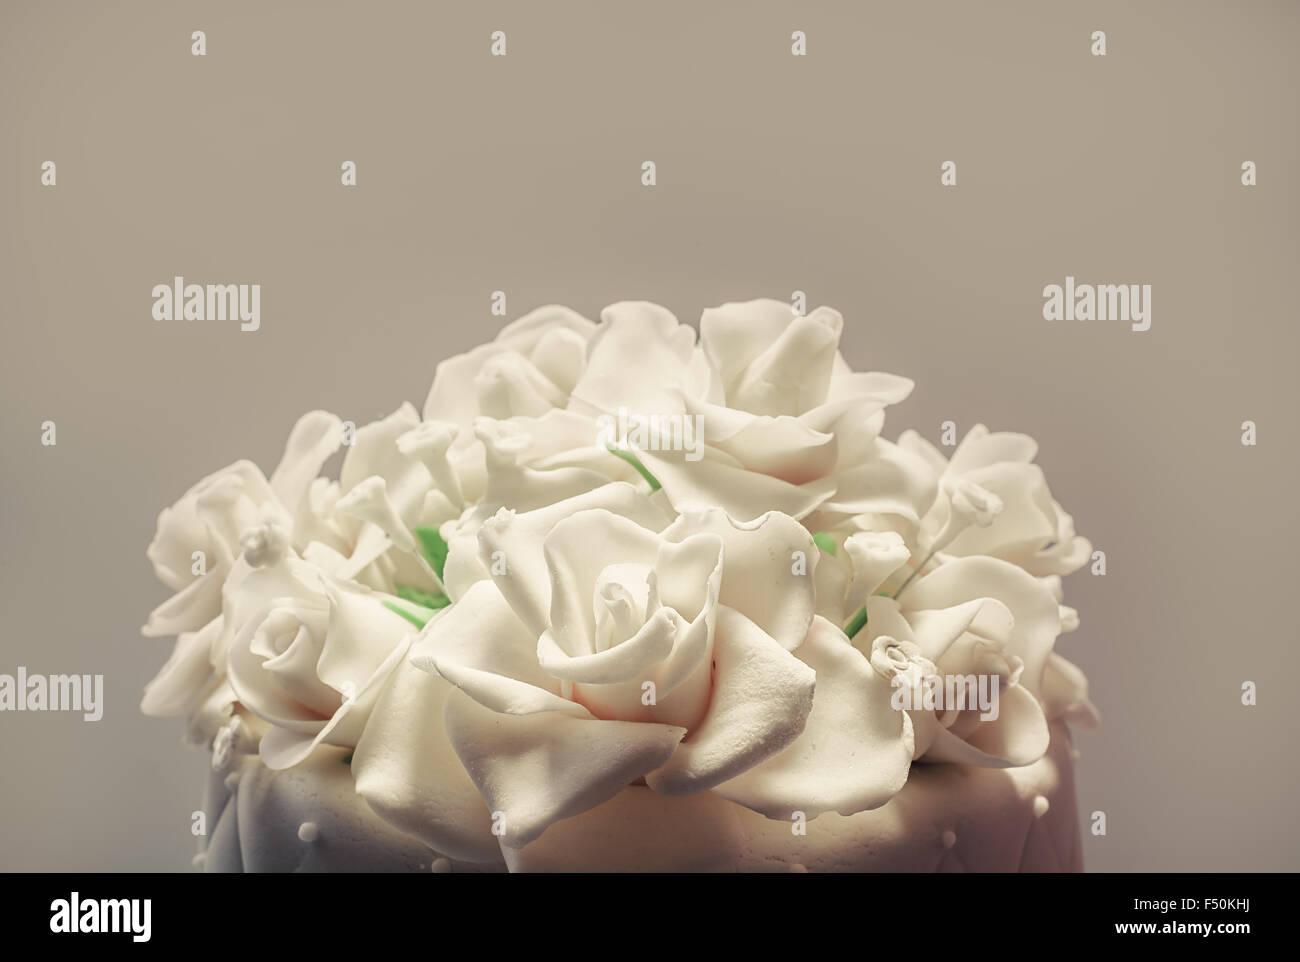 Details of a wedding cake, decoration with white fondant on white background. - Stock Image